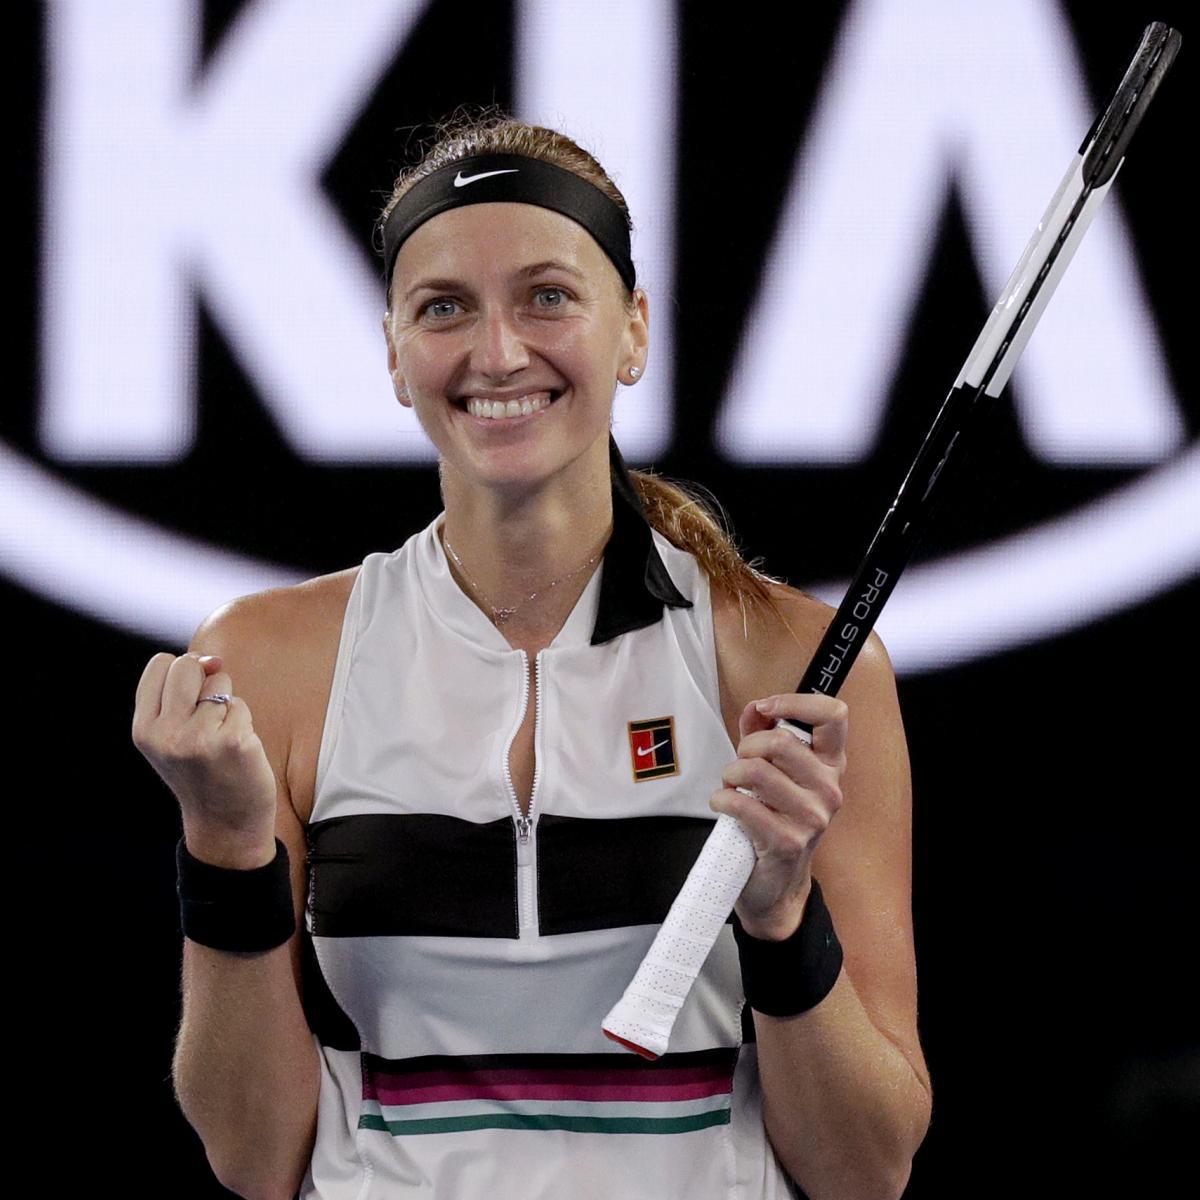 Australian Open 2019 Women's Semifinal: TV Schedule, Start